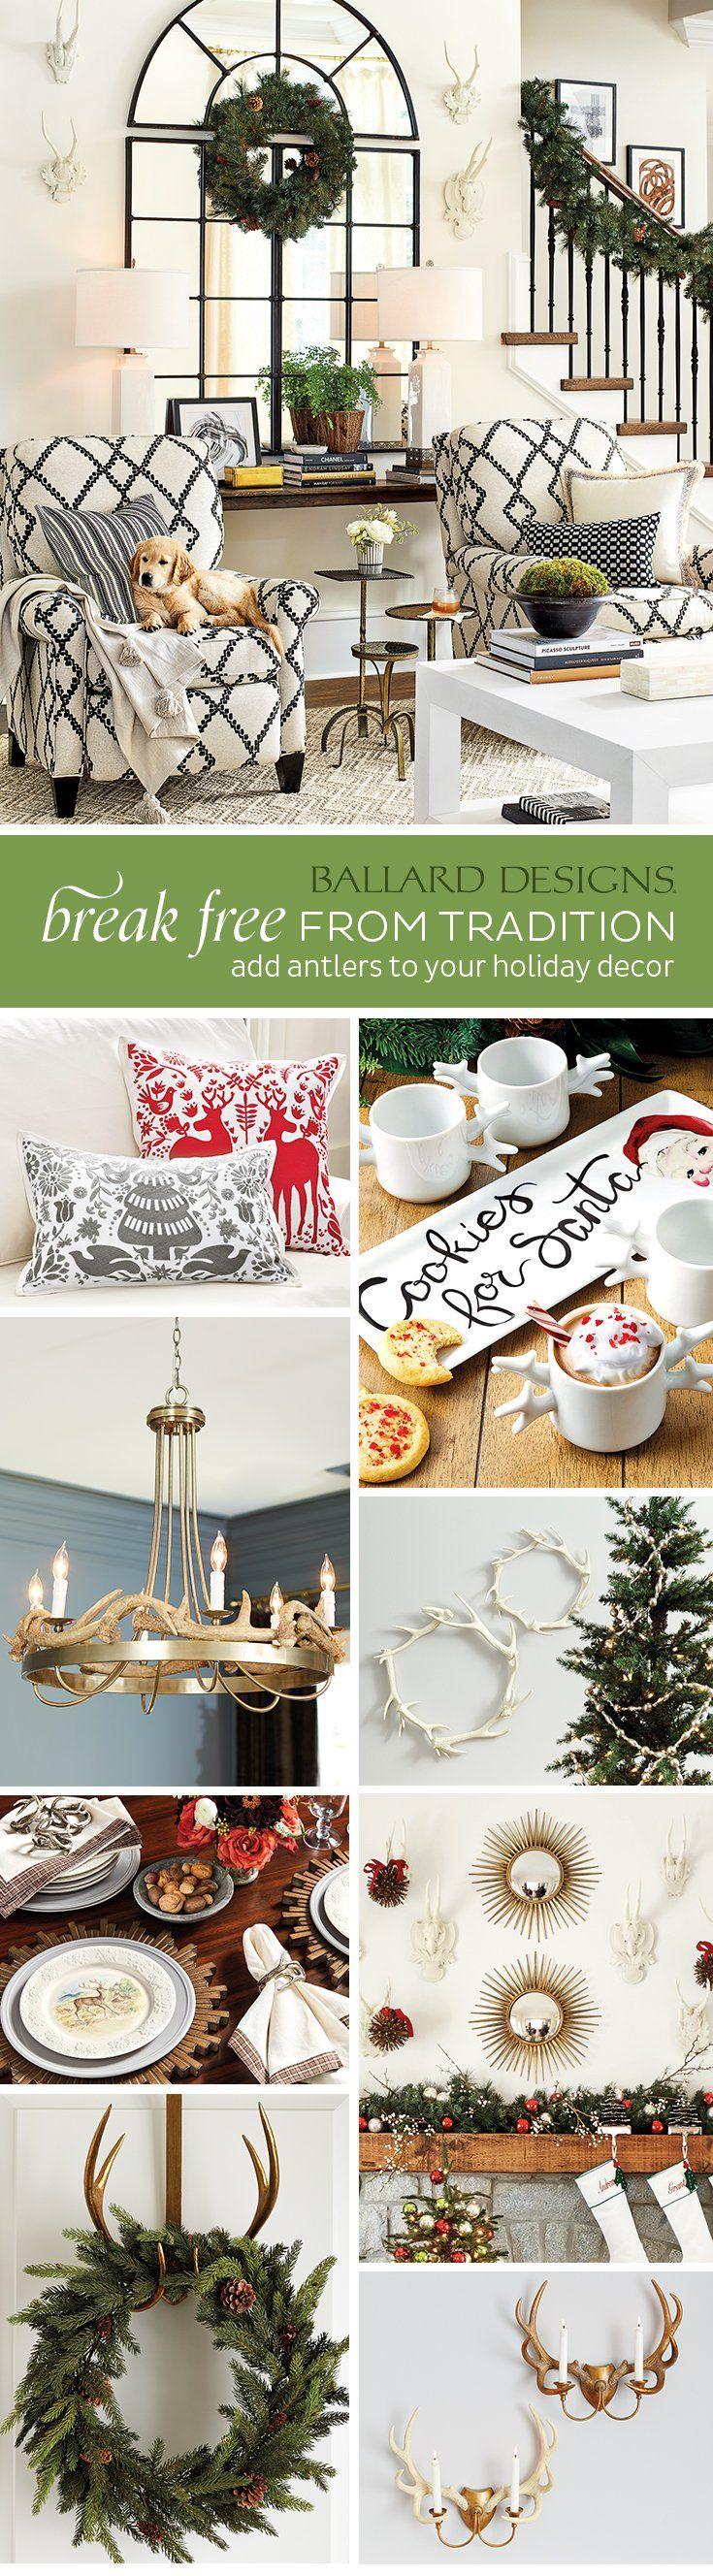 Antler Holiday Decor Ideas - Ballard Designs